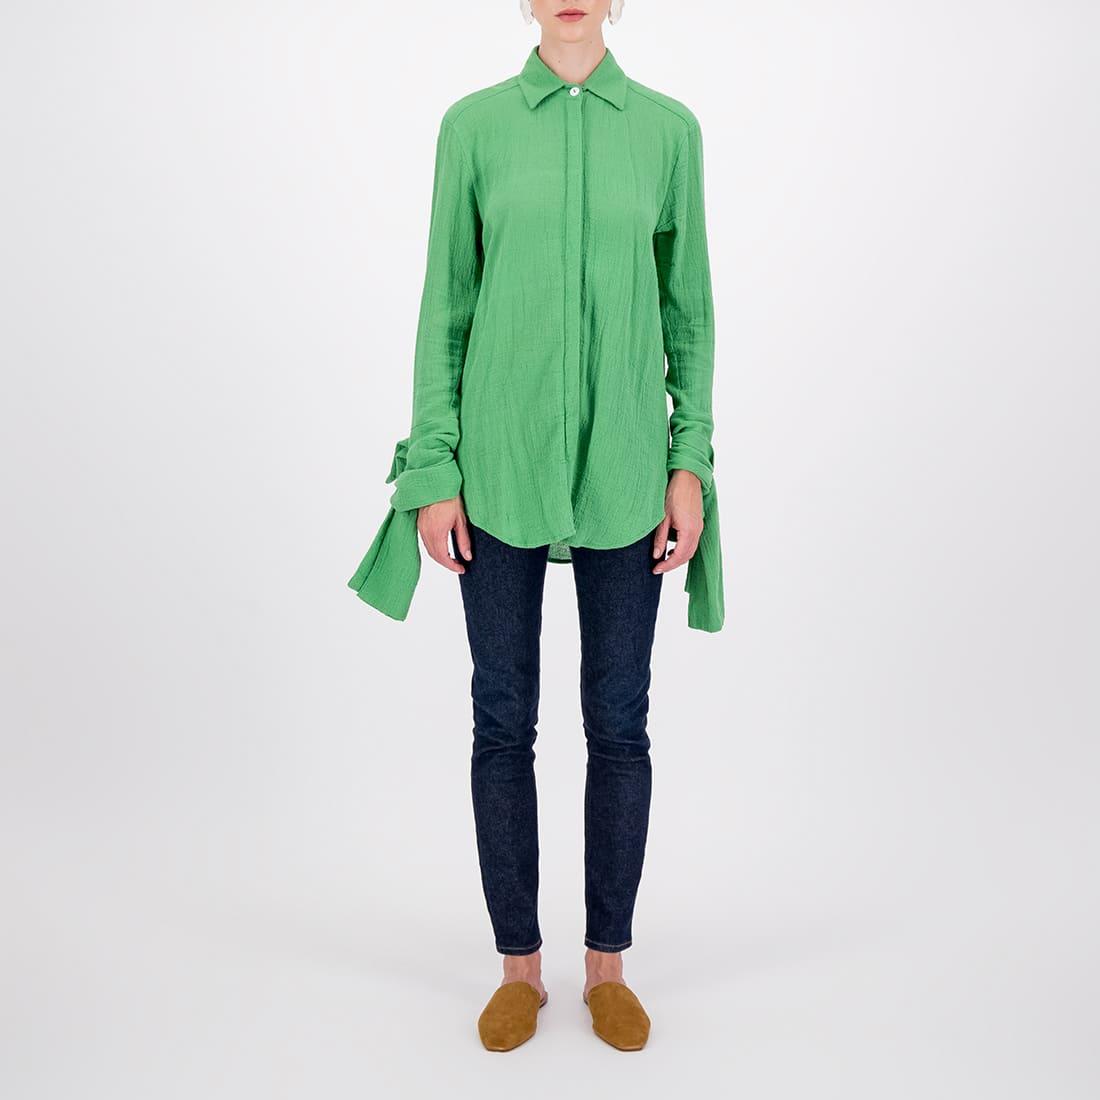 Sweetheart neckline blouse in 100% cotton 2